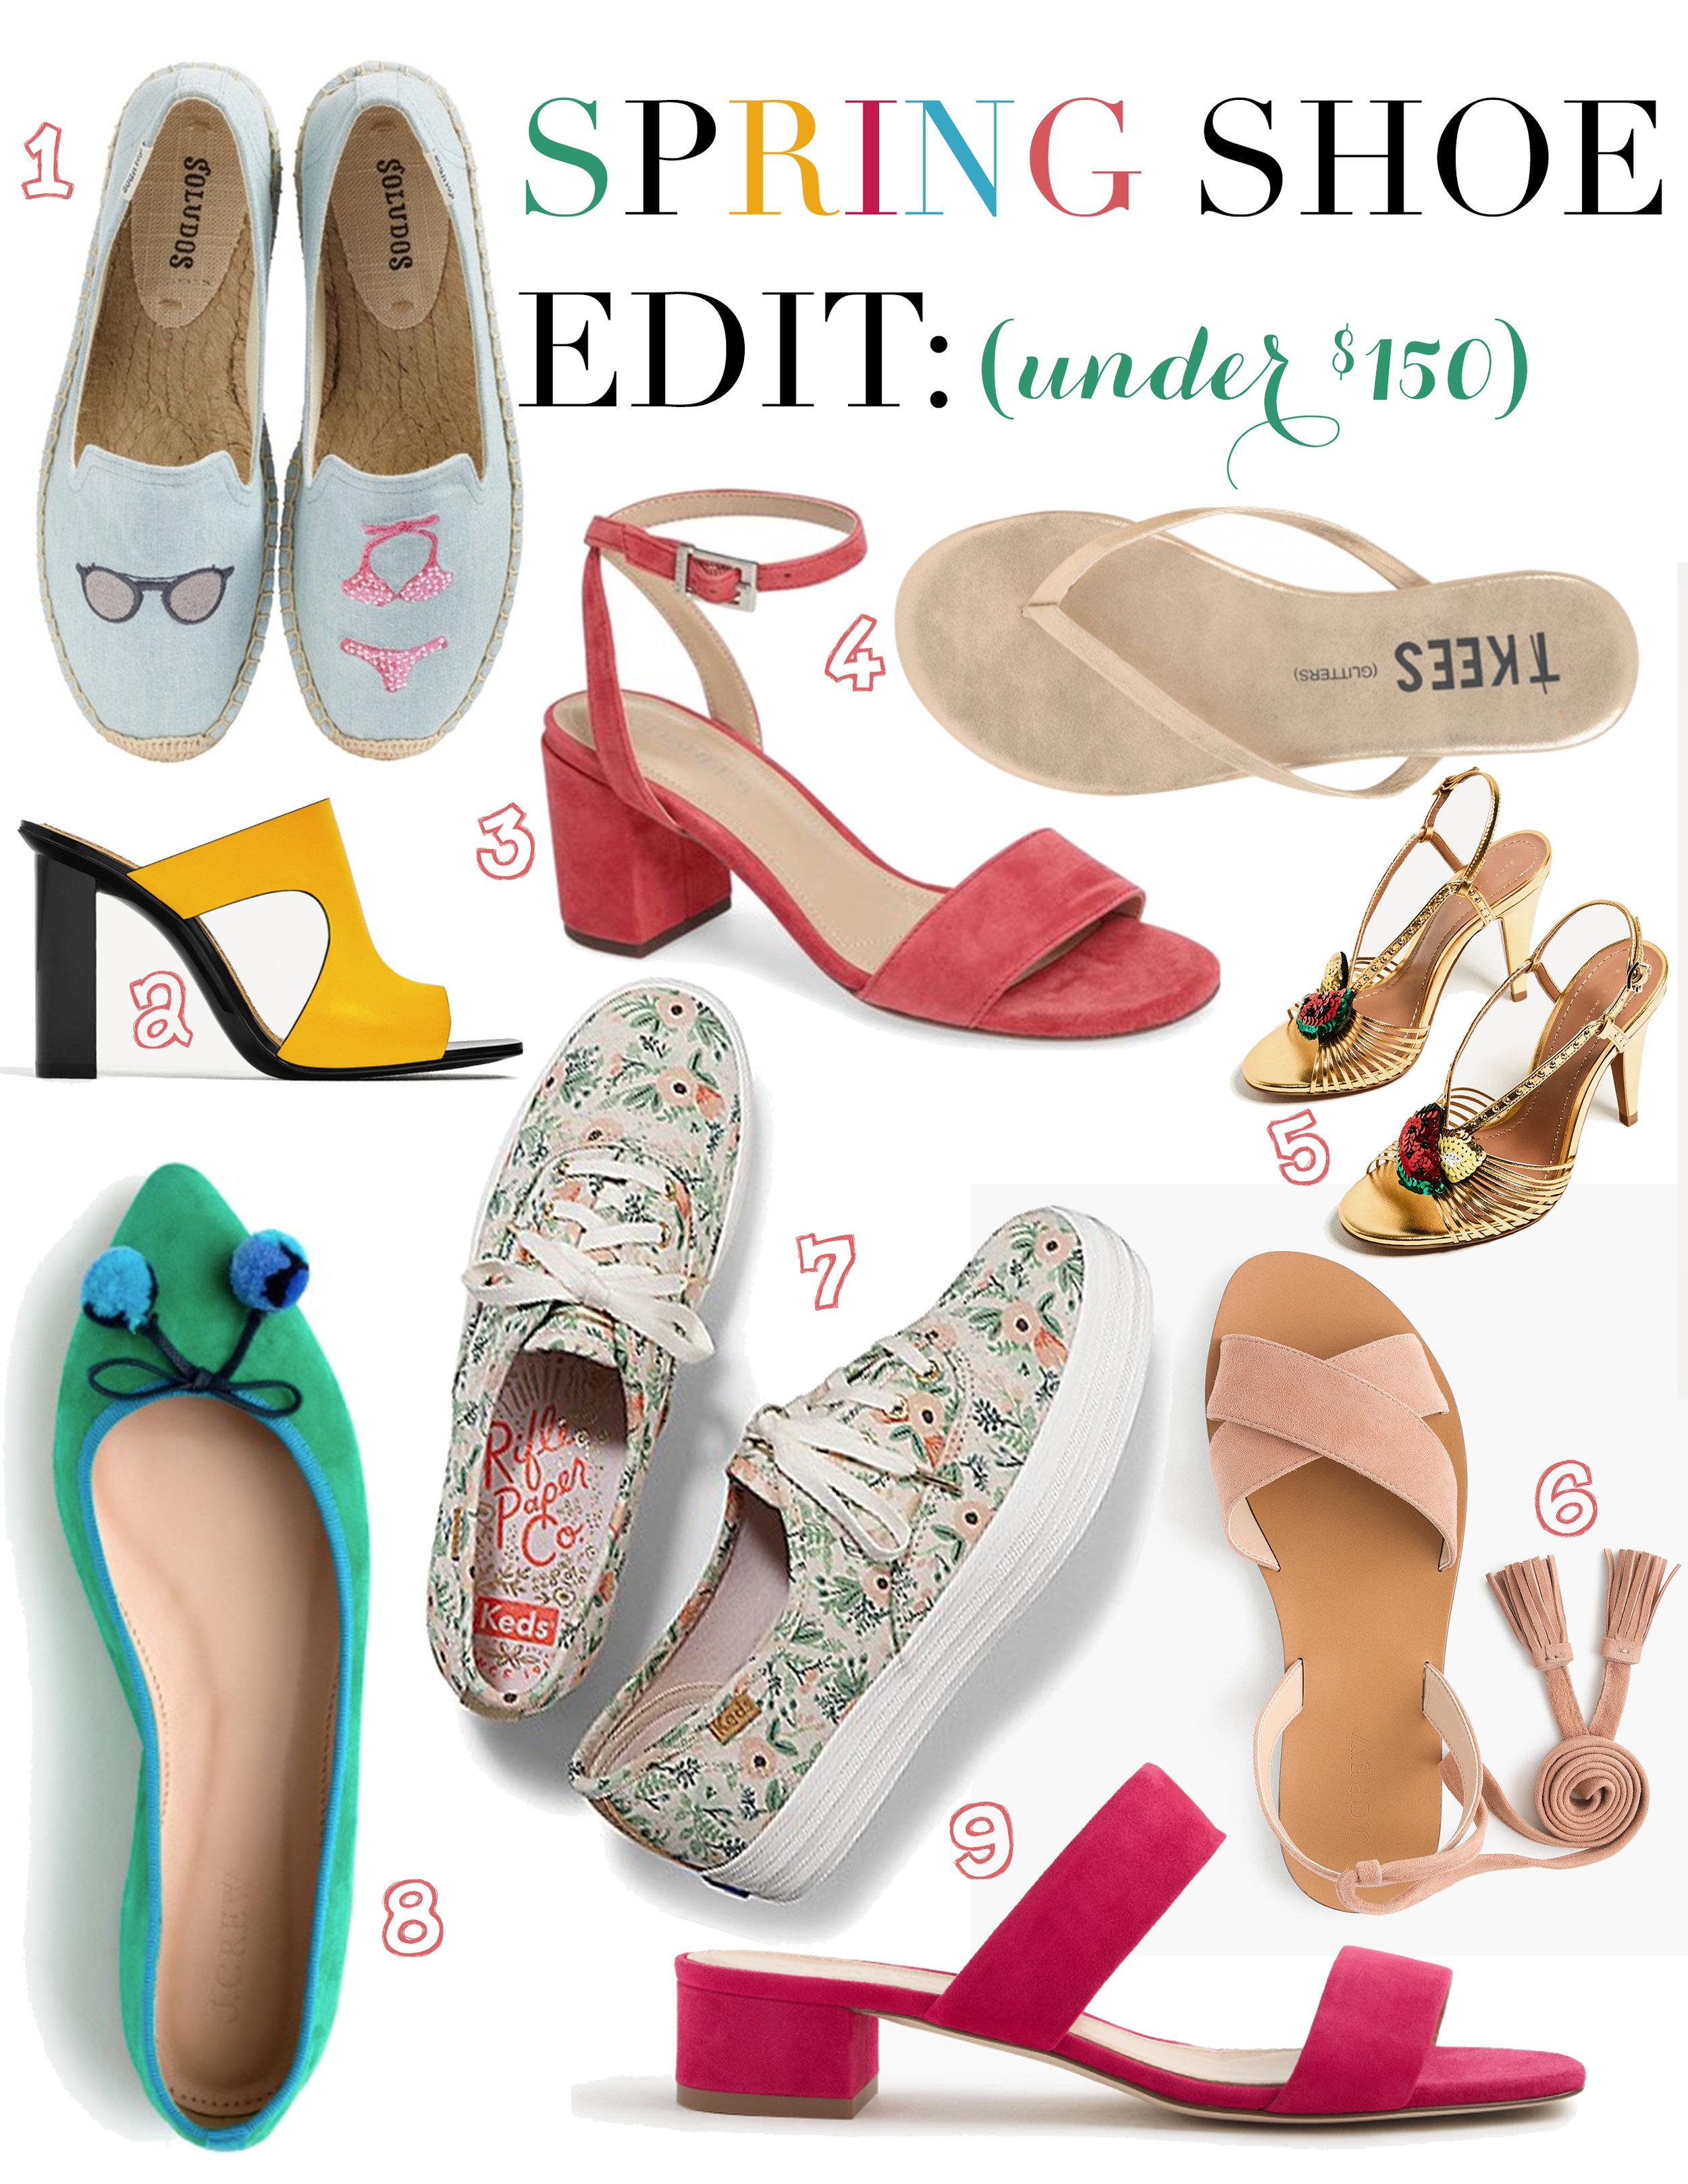 Spring shoe edit under 150.jpg